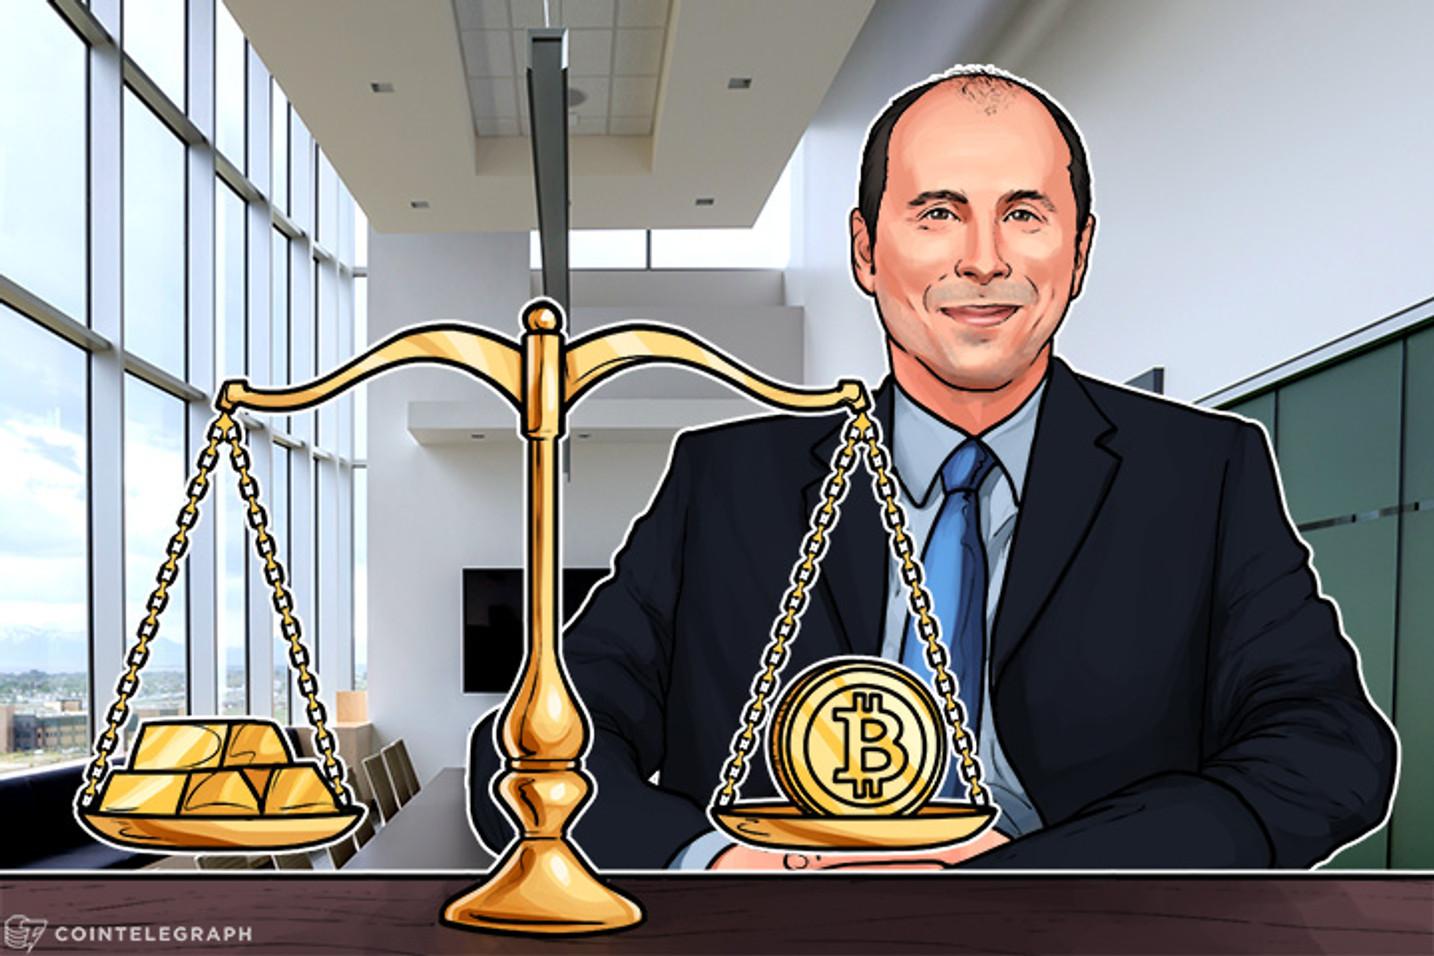 Merrill Lynch Plots Bitcoin's Path to Global Legitimacy